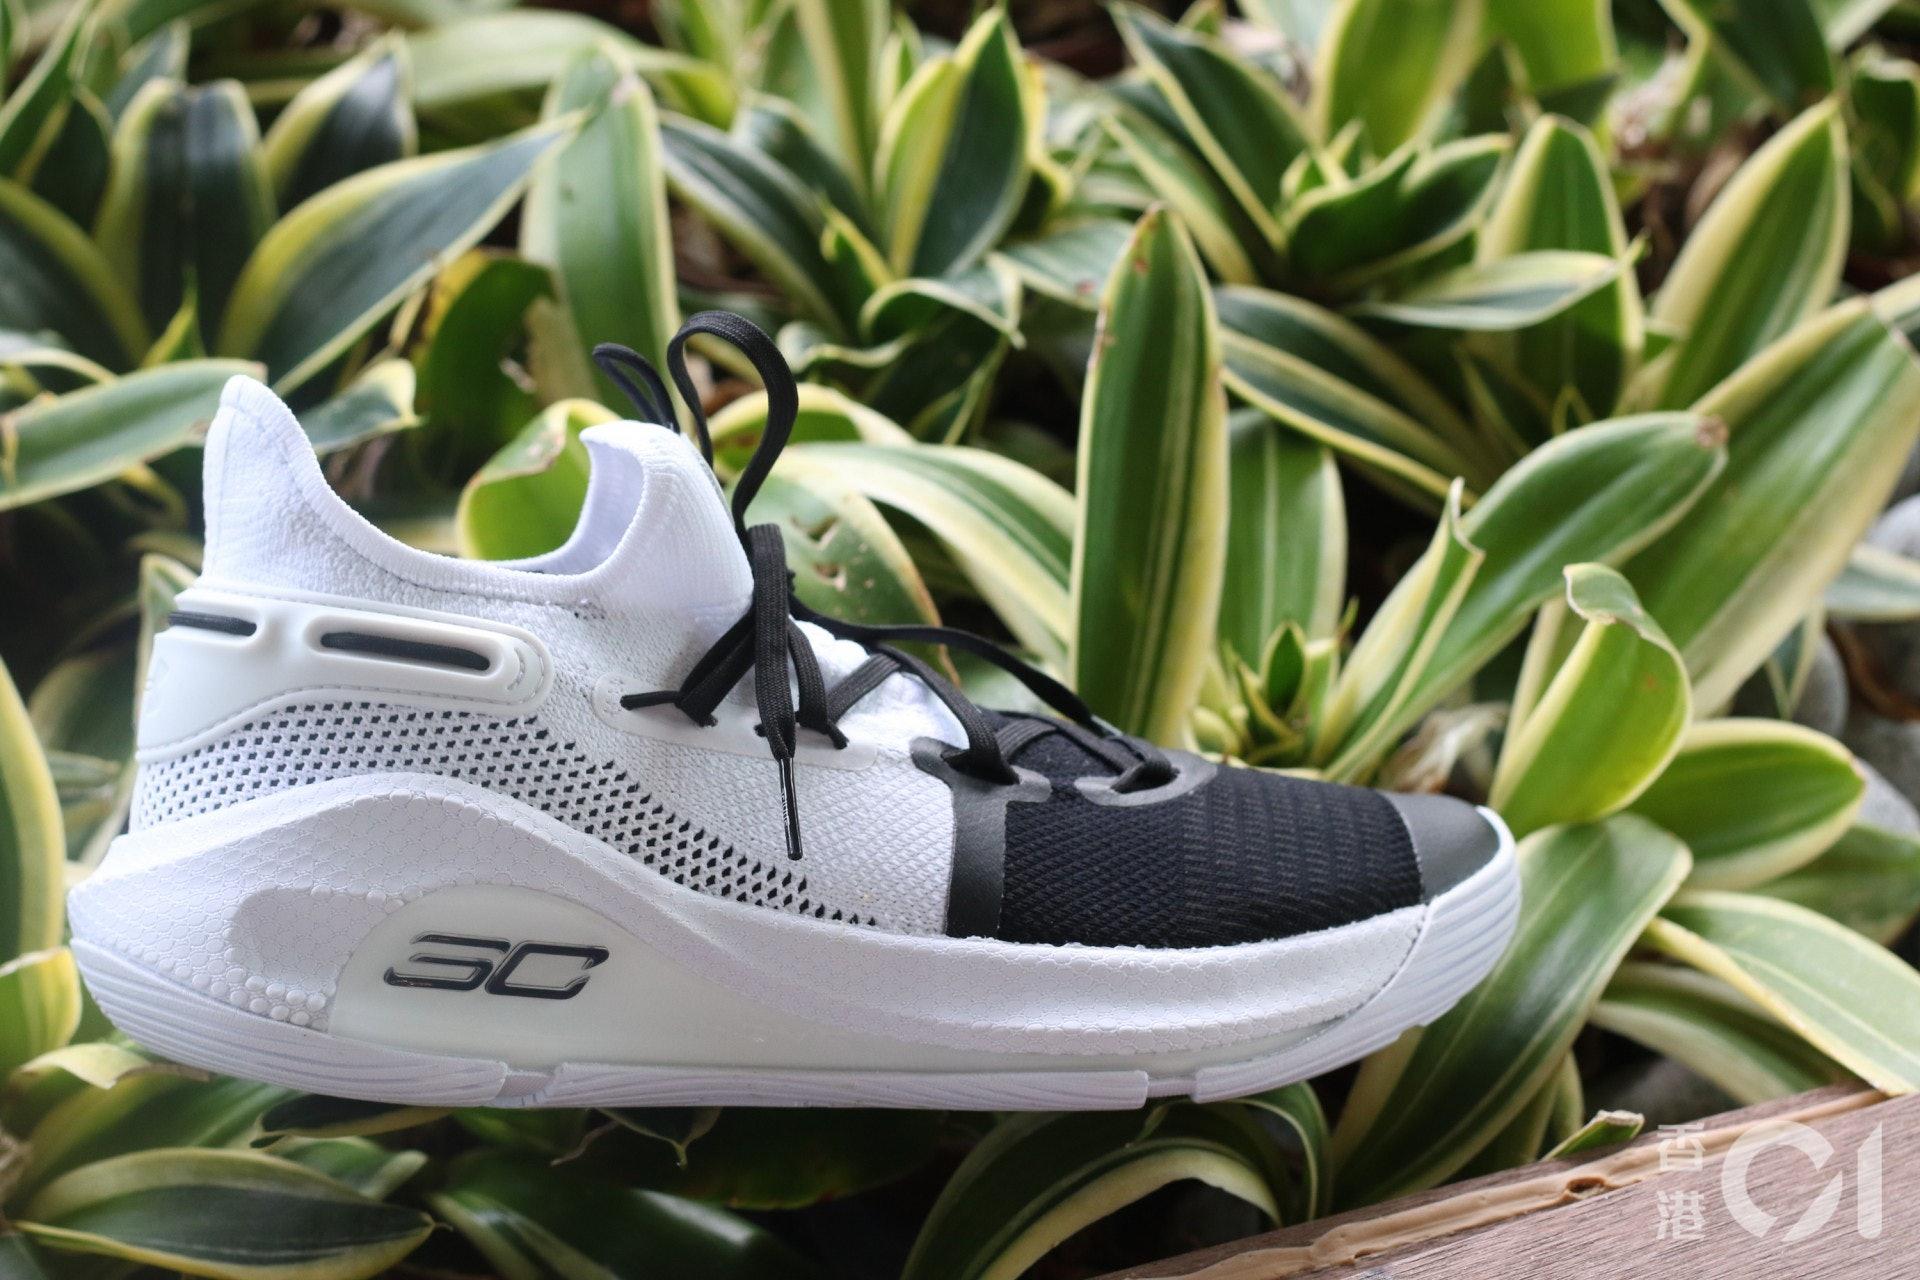 hot sale online e7b7e 0bd62 籃鞋癡】回應用家呼喚Curry 6 HOVR緩震保護|香港01|Jumper